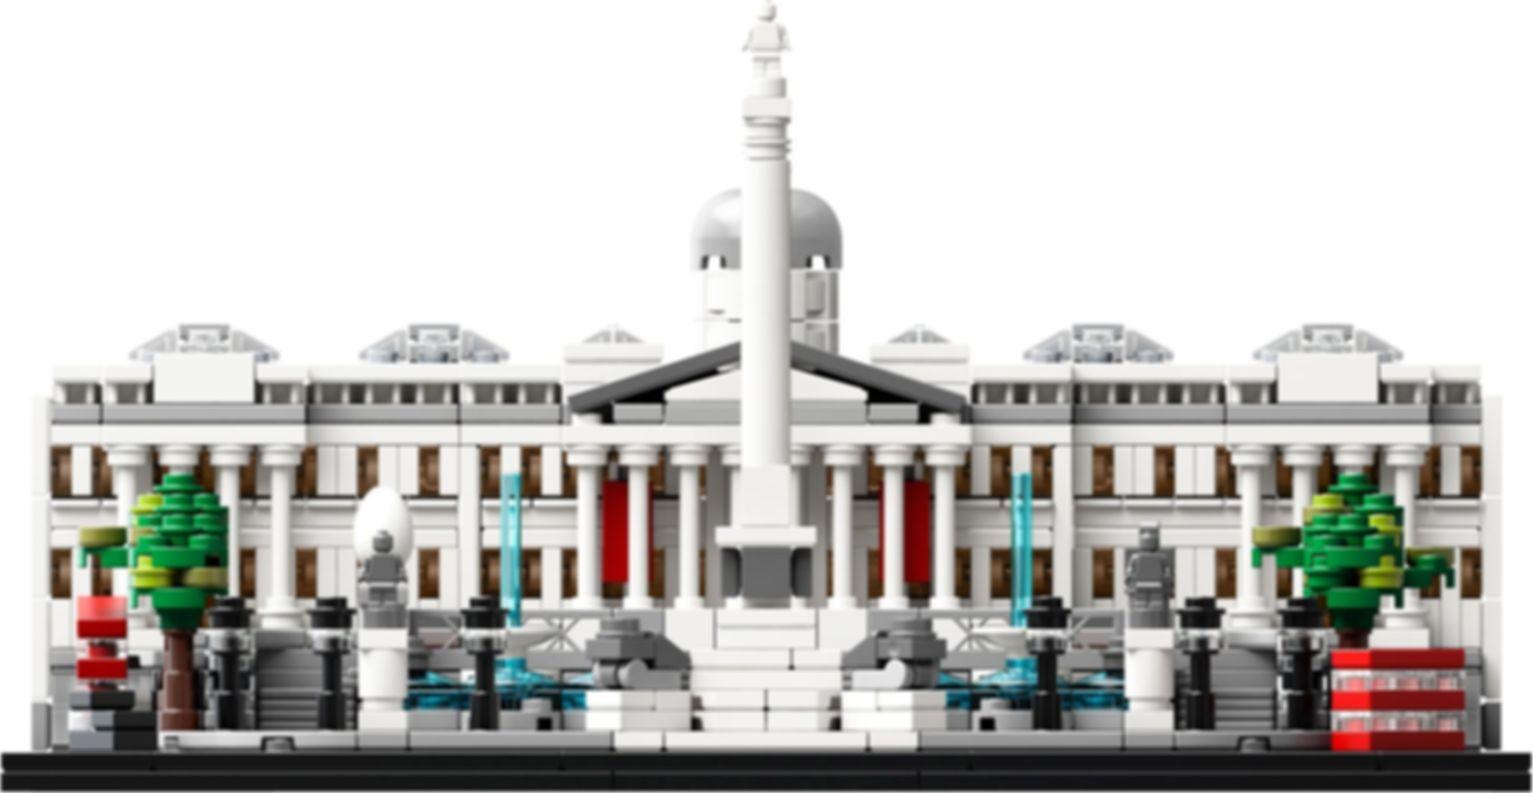 Trafalger Square components